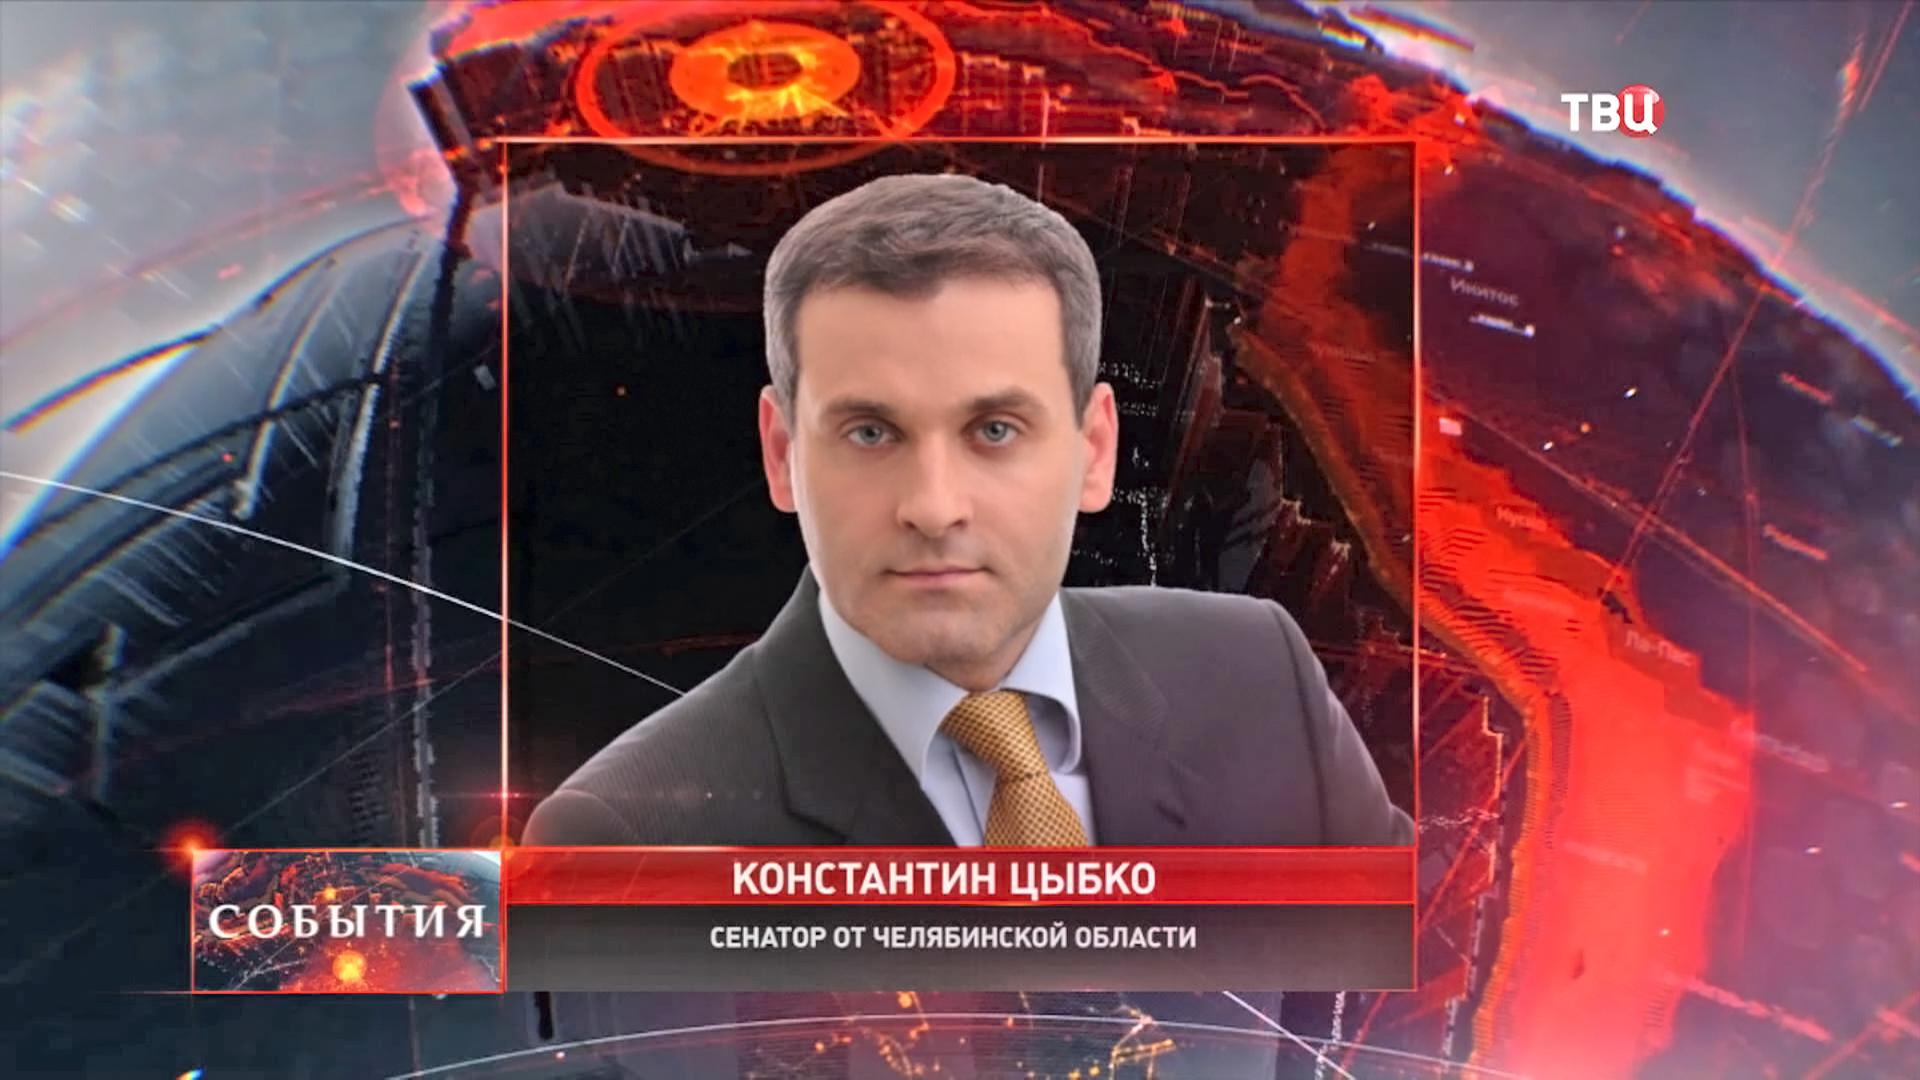 Cенатор Константин Цыбко